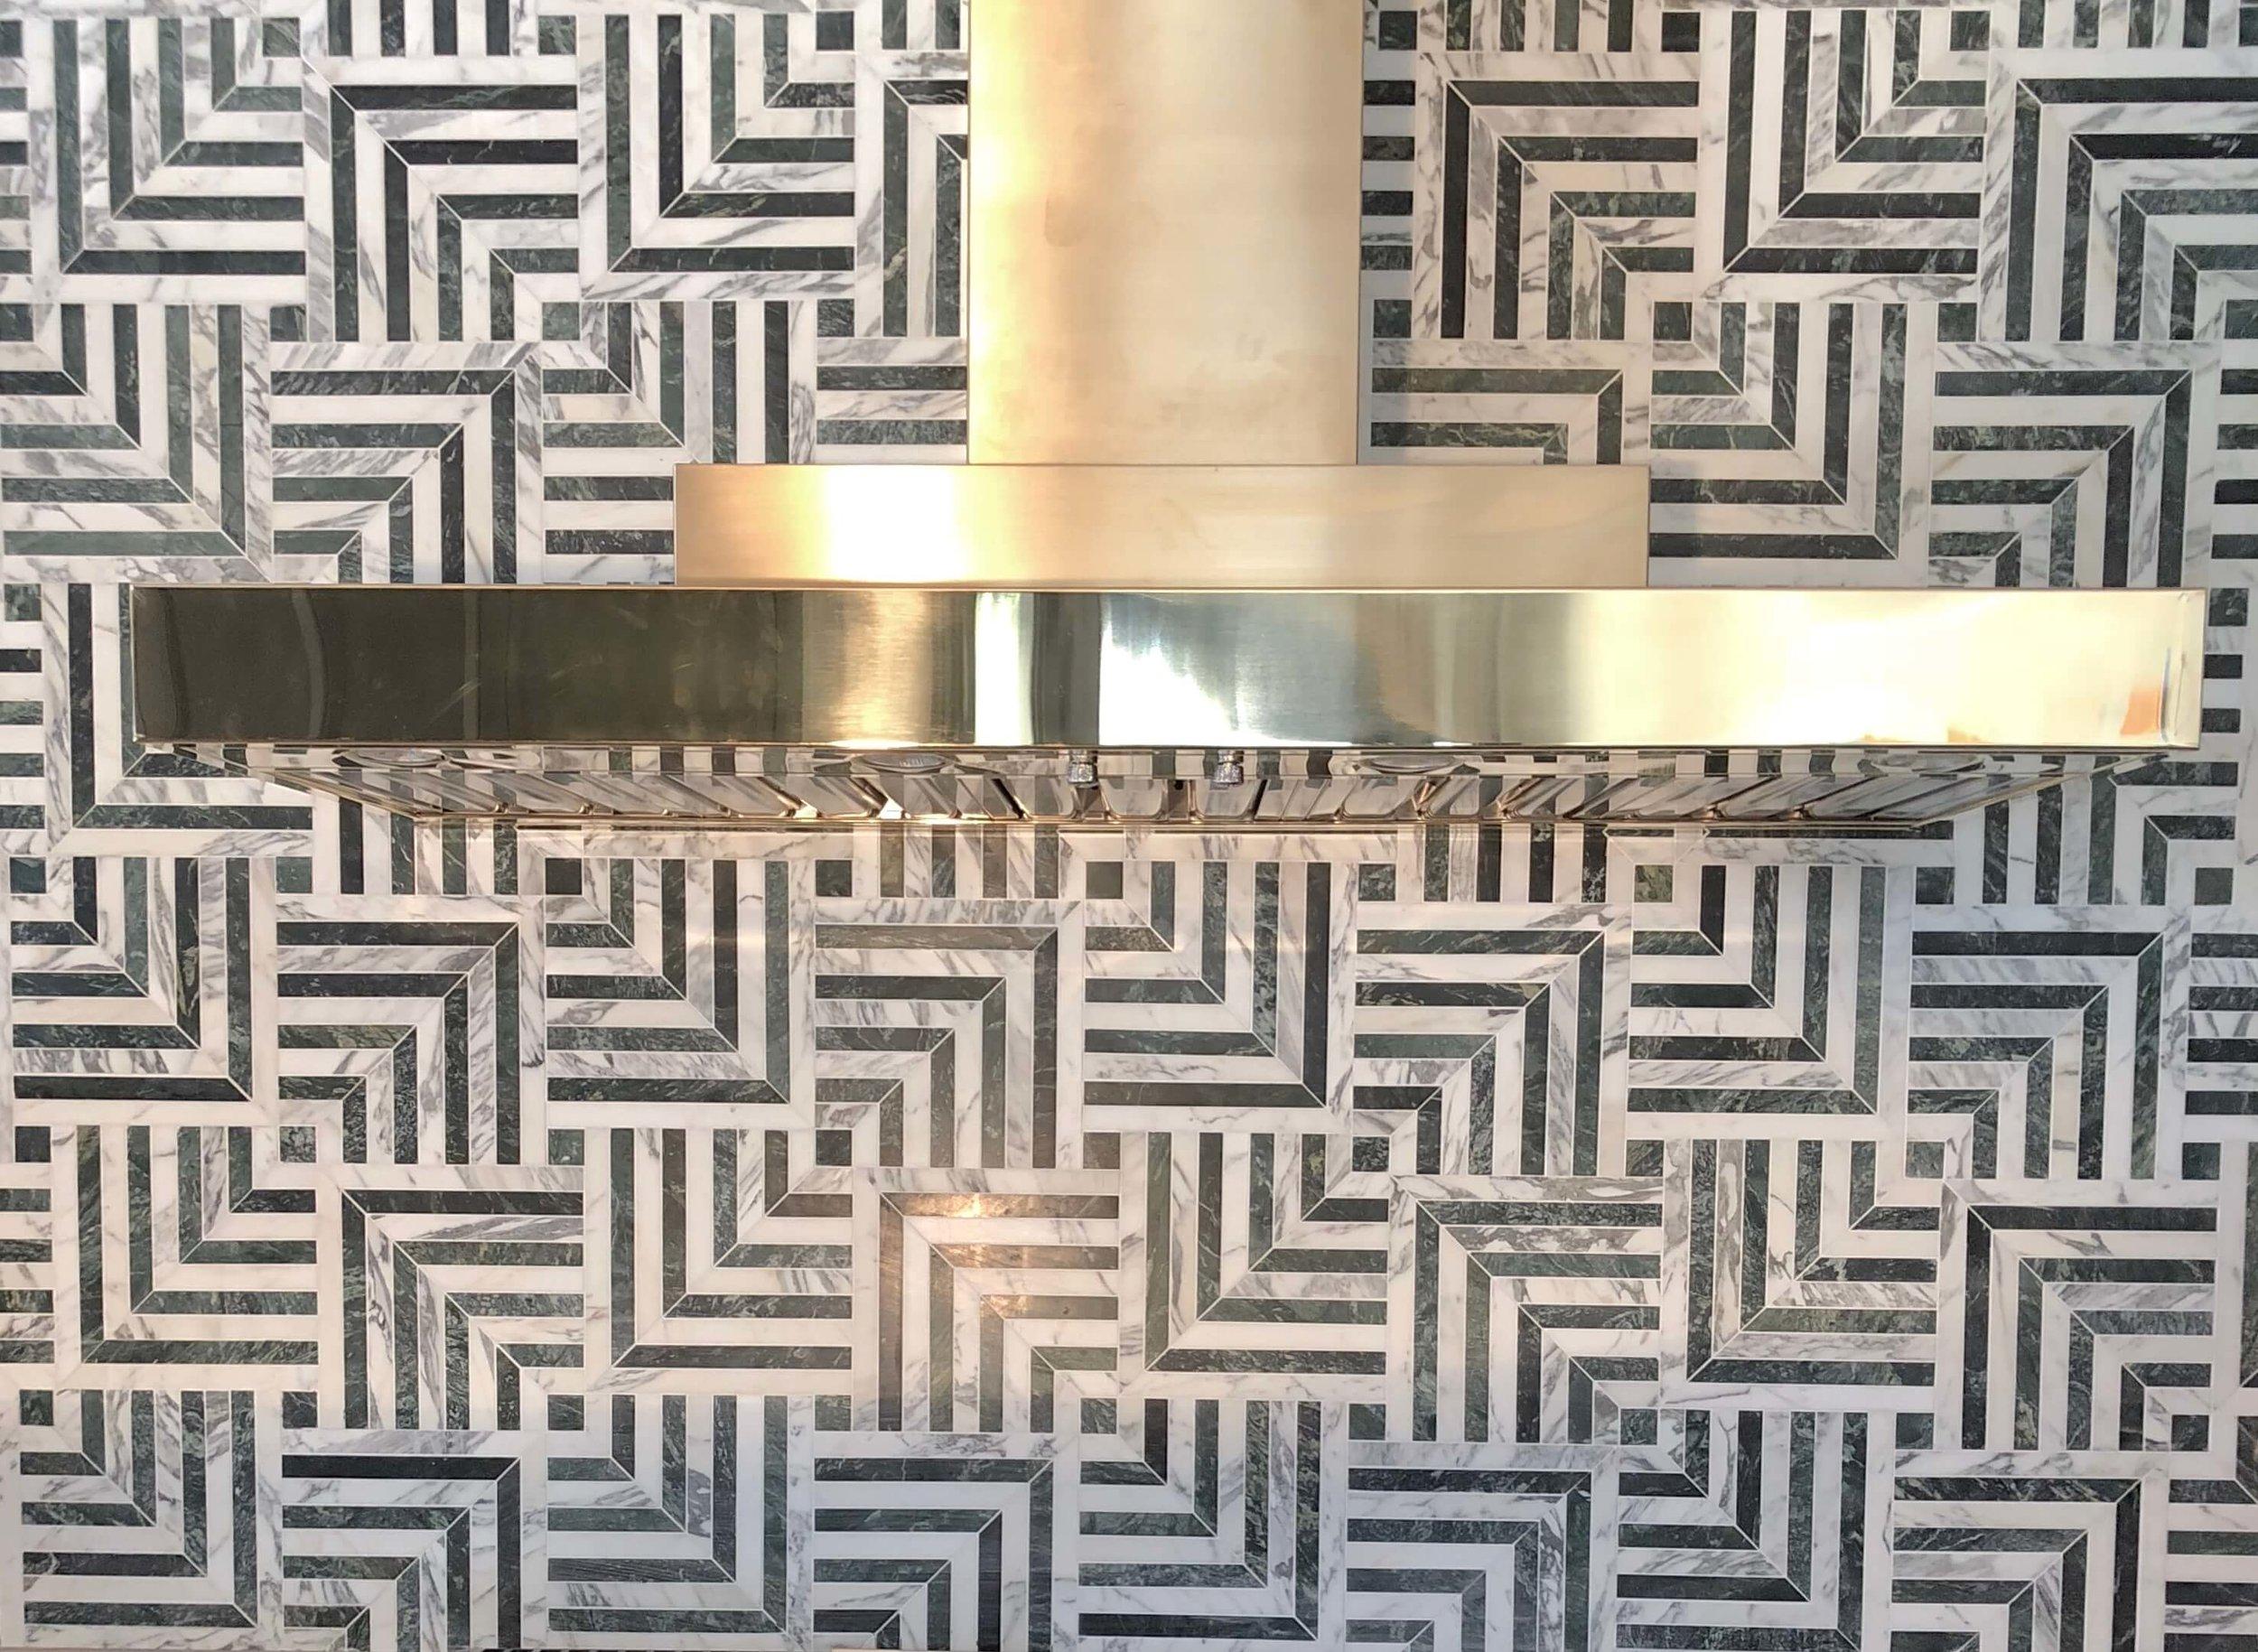 Marble mosaic tile backsplash with brass venthood - Kitchen designed by Jeanne K Chung #brass #venthood #marblemosaic #backsplash #marblebacksplash #kitchendesignideas